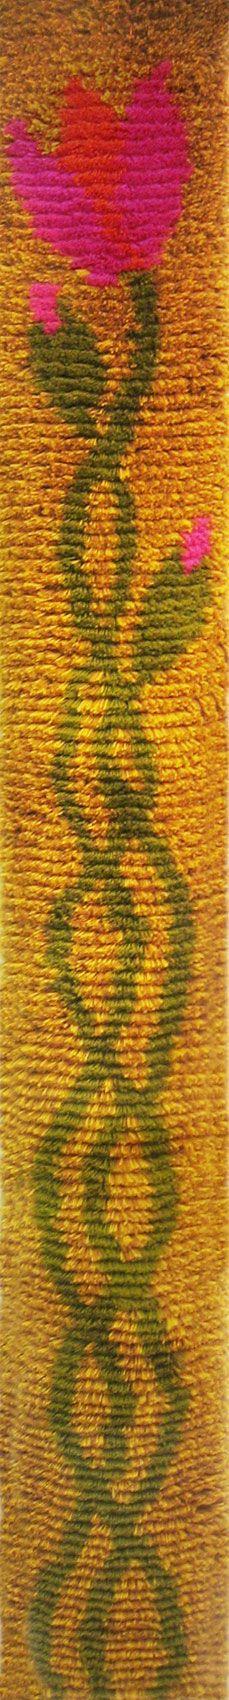 Keisarin morsian keltainen ommellen 25 x 200 Design Jukka Vesterinen Rya Rug, Wool Rug, Wall Hangings, New Art, Weaving, Arts And Crafts, Rugs, Knitting, Crochet